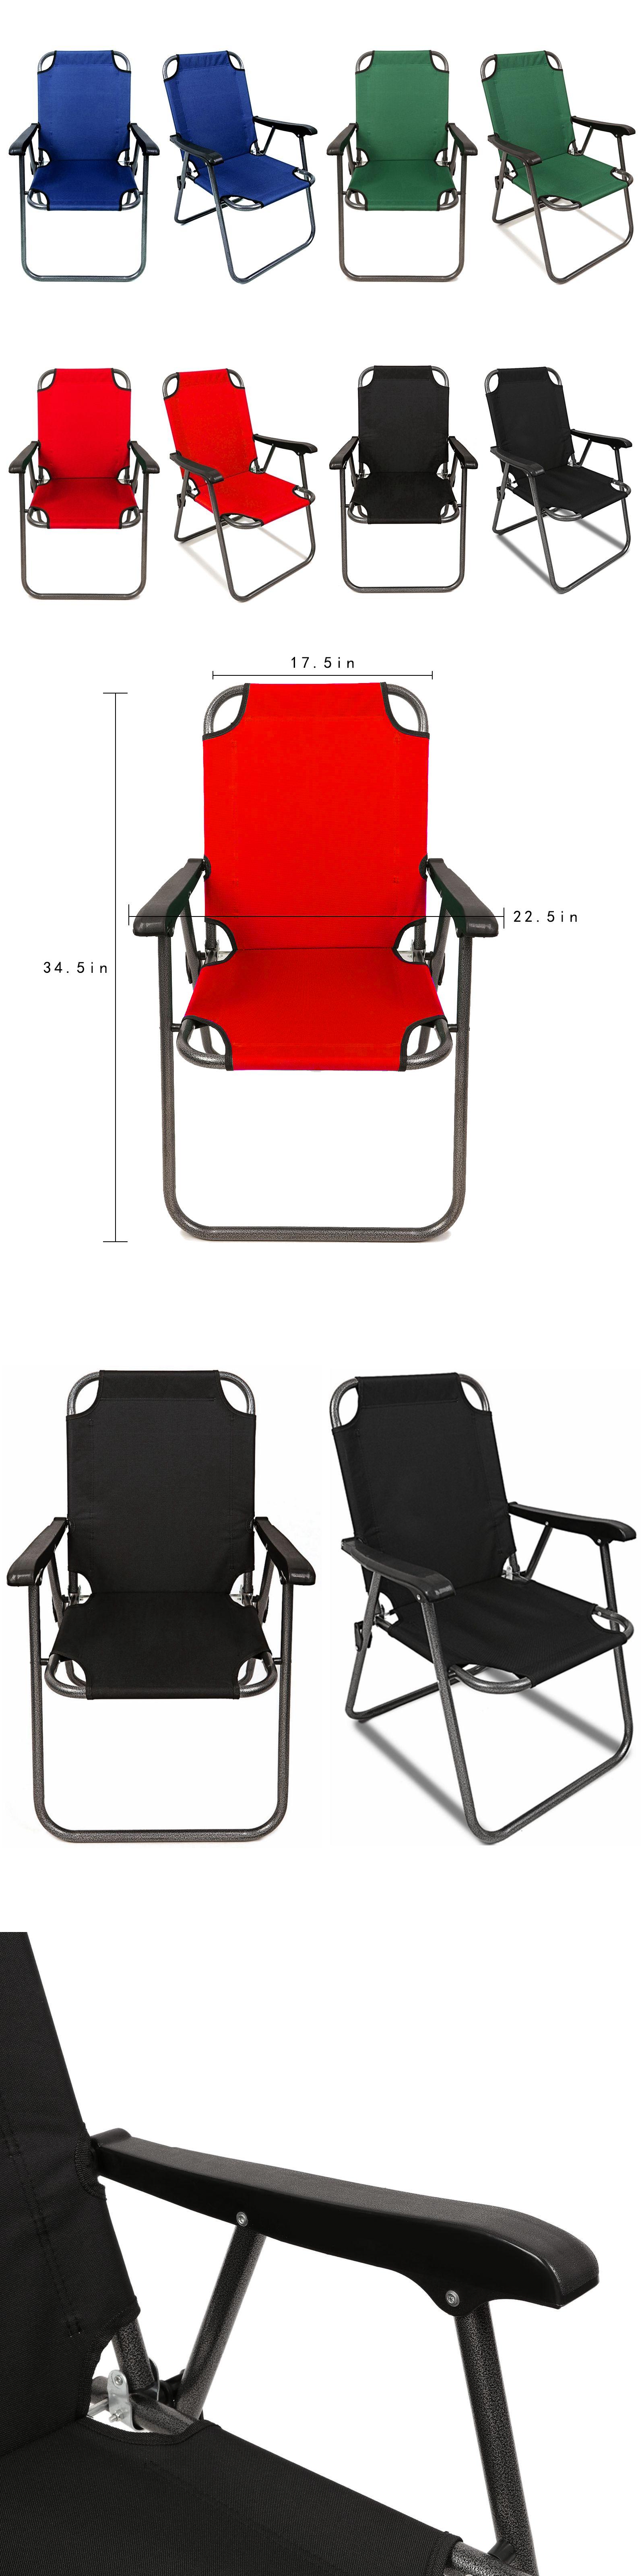 Camping Furniture 16038: 2 Portable Folding Chair Beach Chair Lightweight  Travel Patio Outdoor Sport Yard